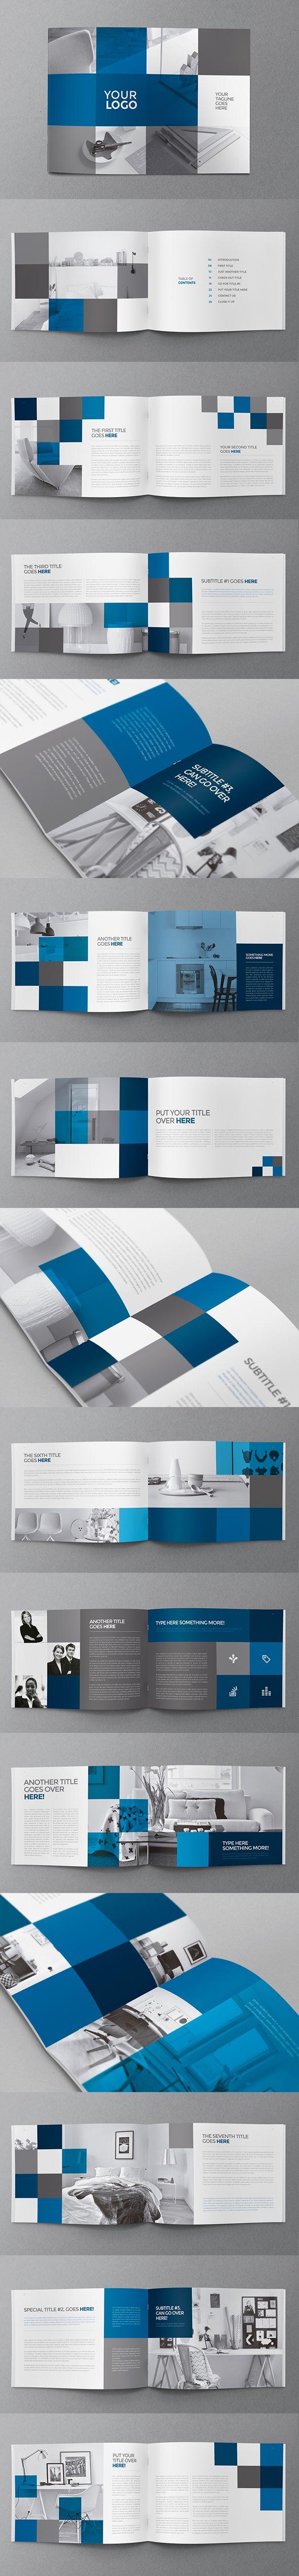 Minimal Blue Squares Brochure. Download here: http://graphicriver.net/item/minimal-blue-squares-brochure/11921055?ref=abradesign